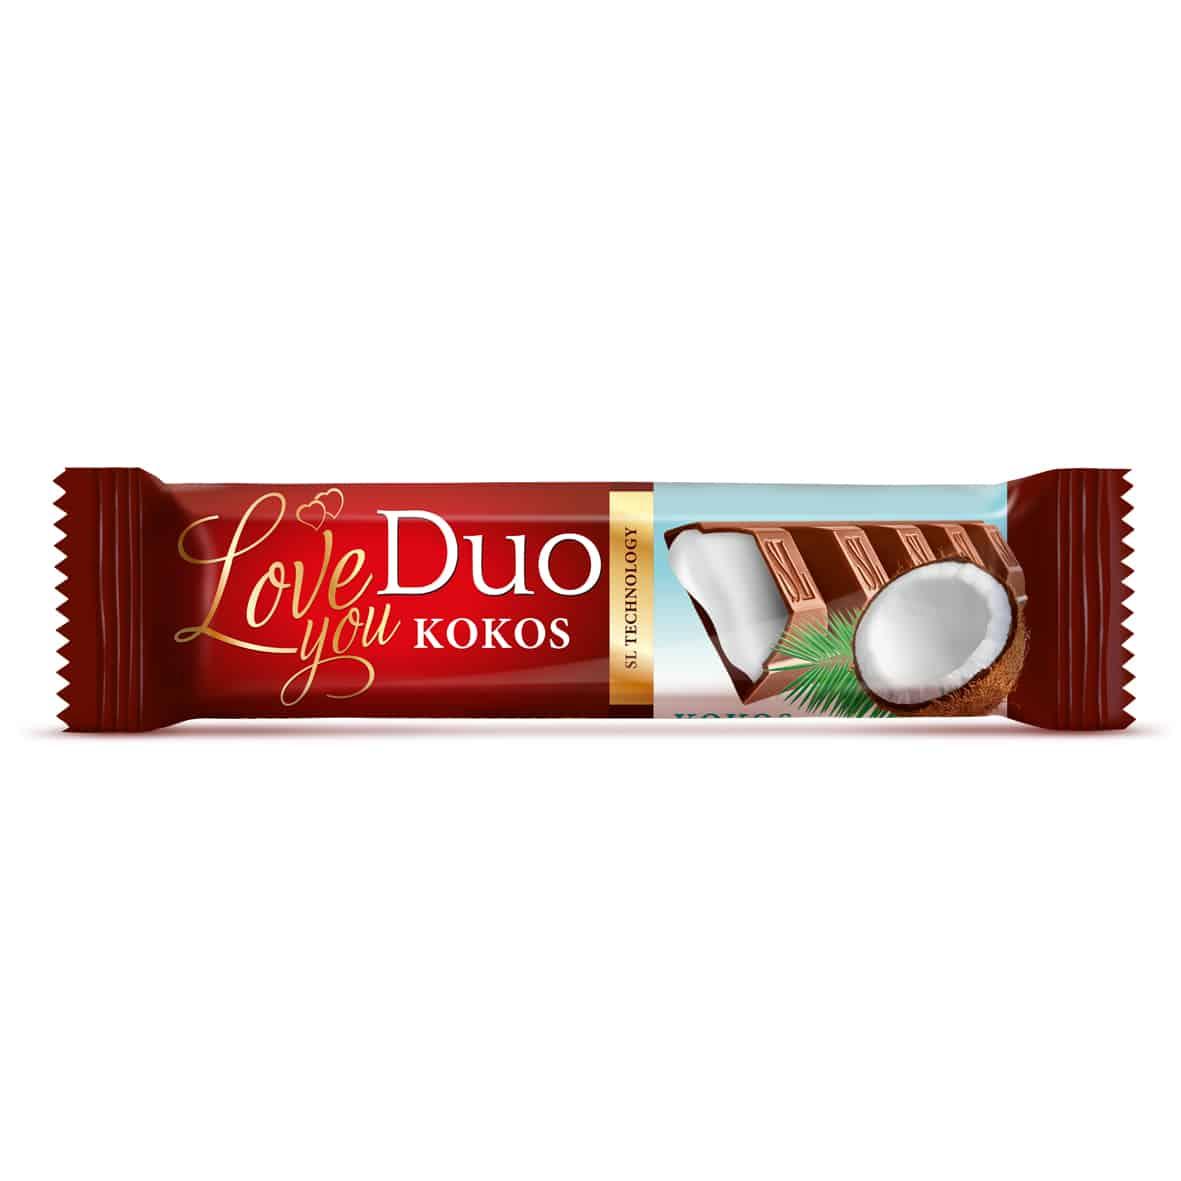 Duo čokolada sa filom kokosa 40g